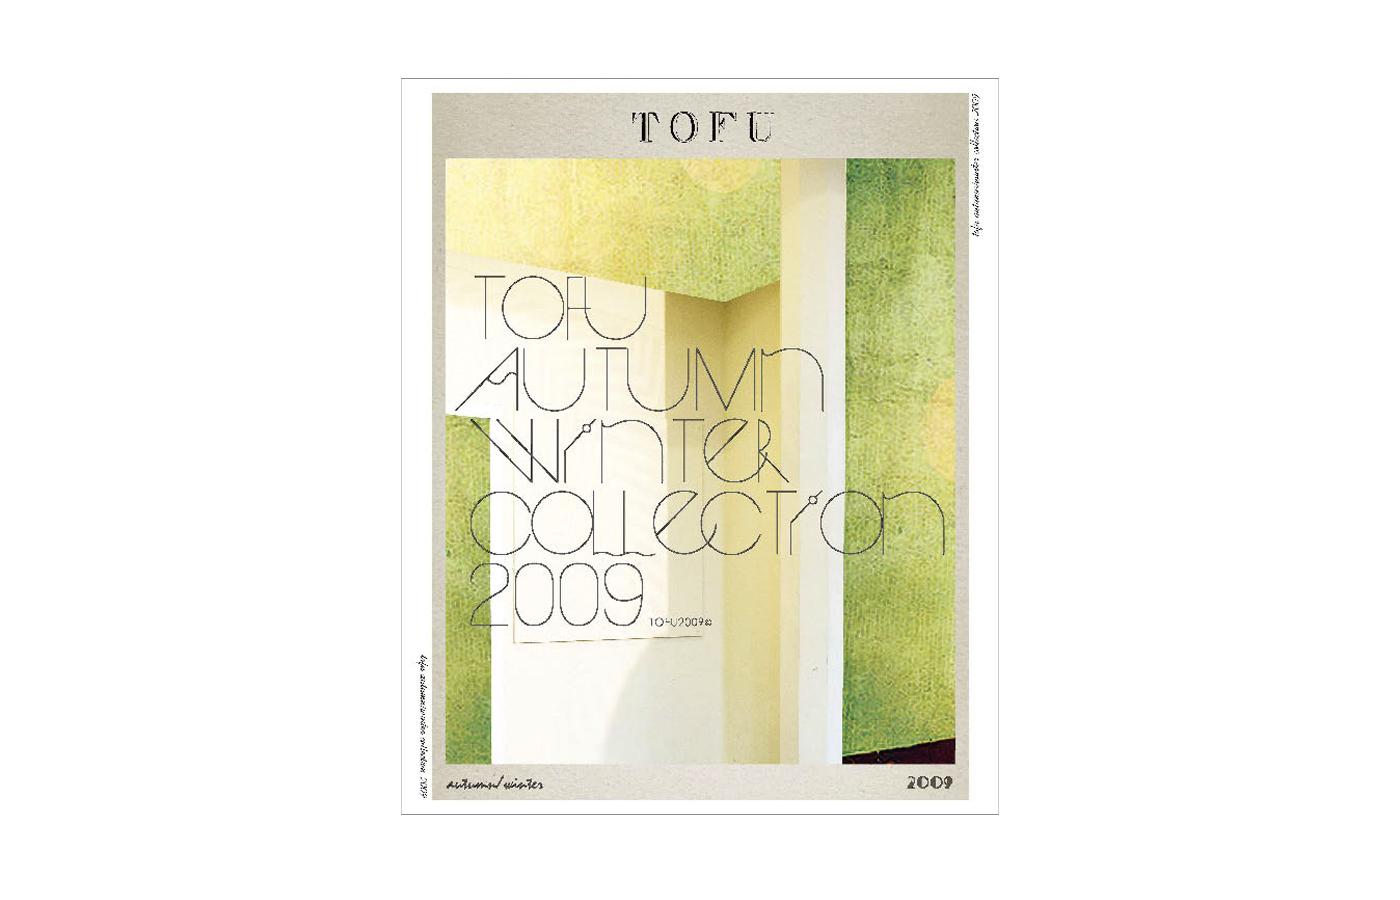 tofuaw2009-13